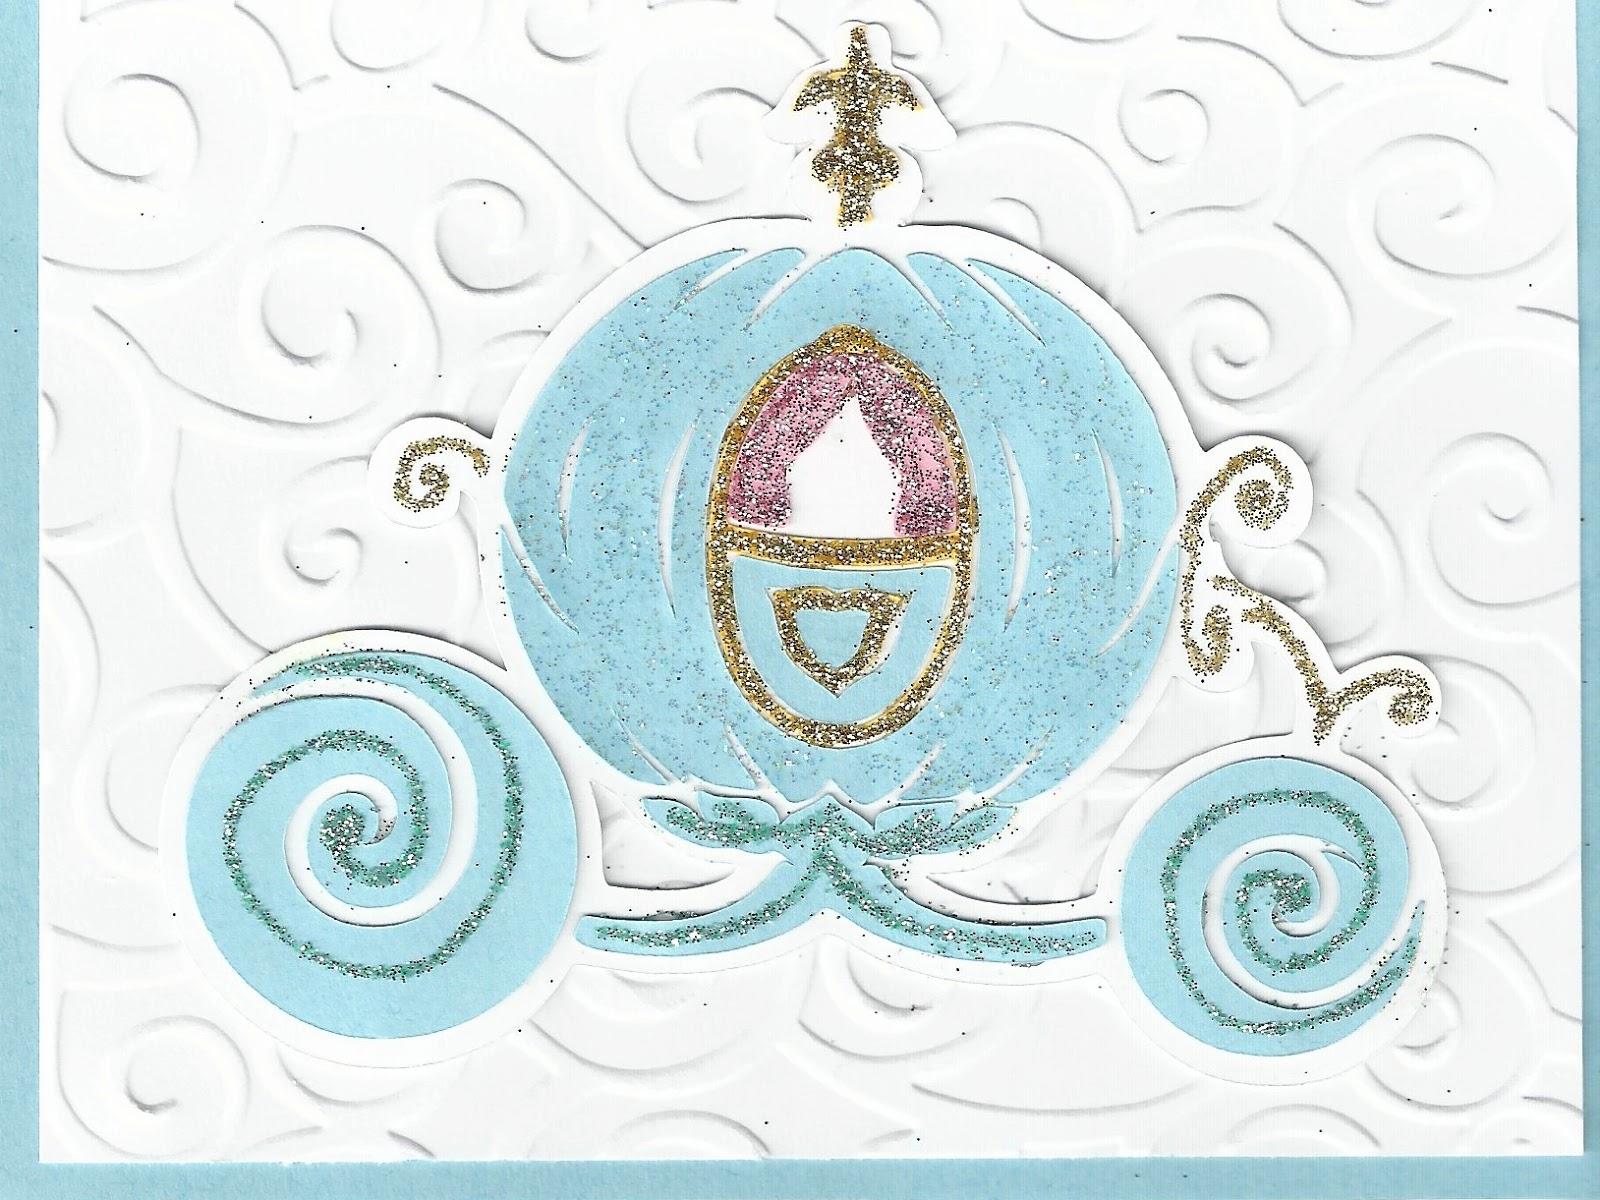 ... Pumpkin Carriage Clipart , Cinderella Pumpkin Carriage Cartoon